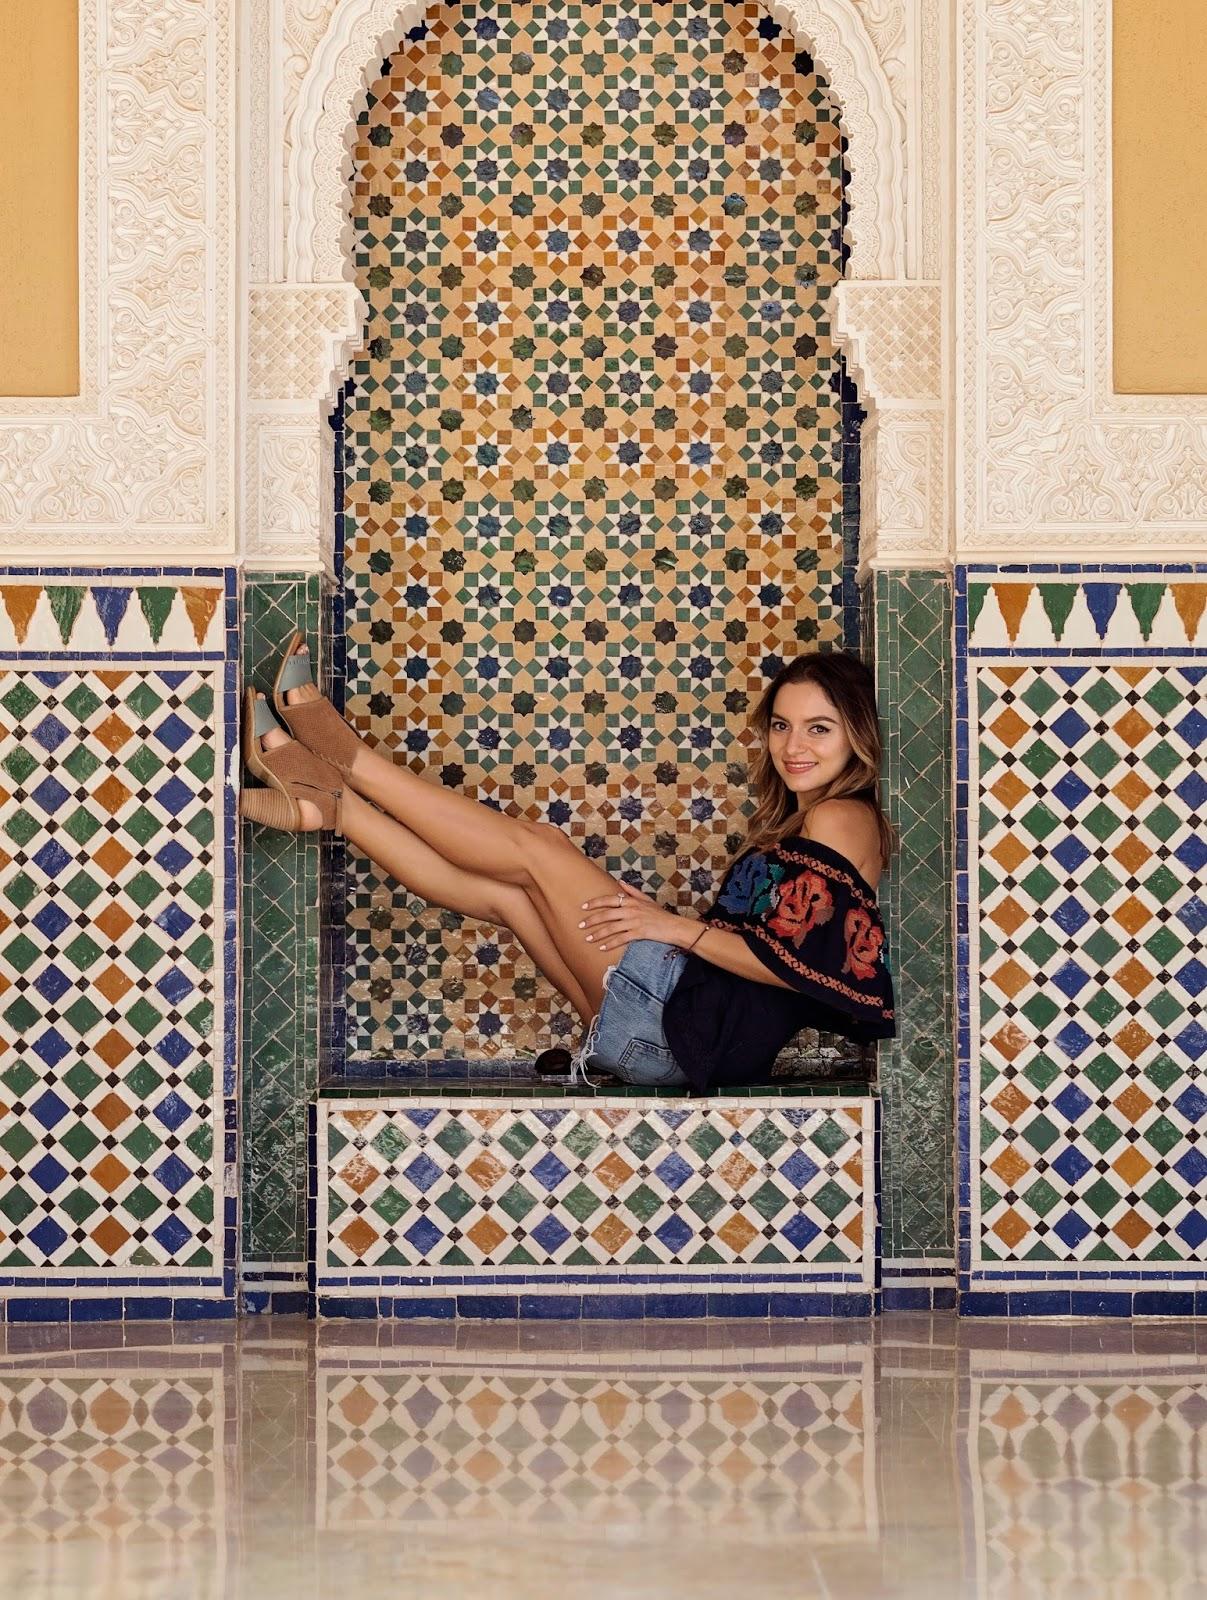 Whitney's Wonderland UK Top Luxury Fashion and Travel Blogger shares her experience at Mazagan Beach Resort with EMU Australia.